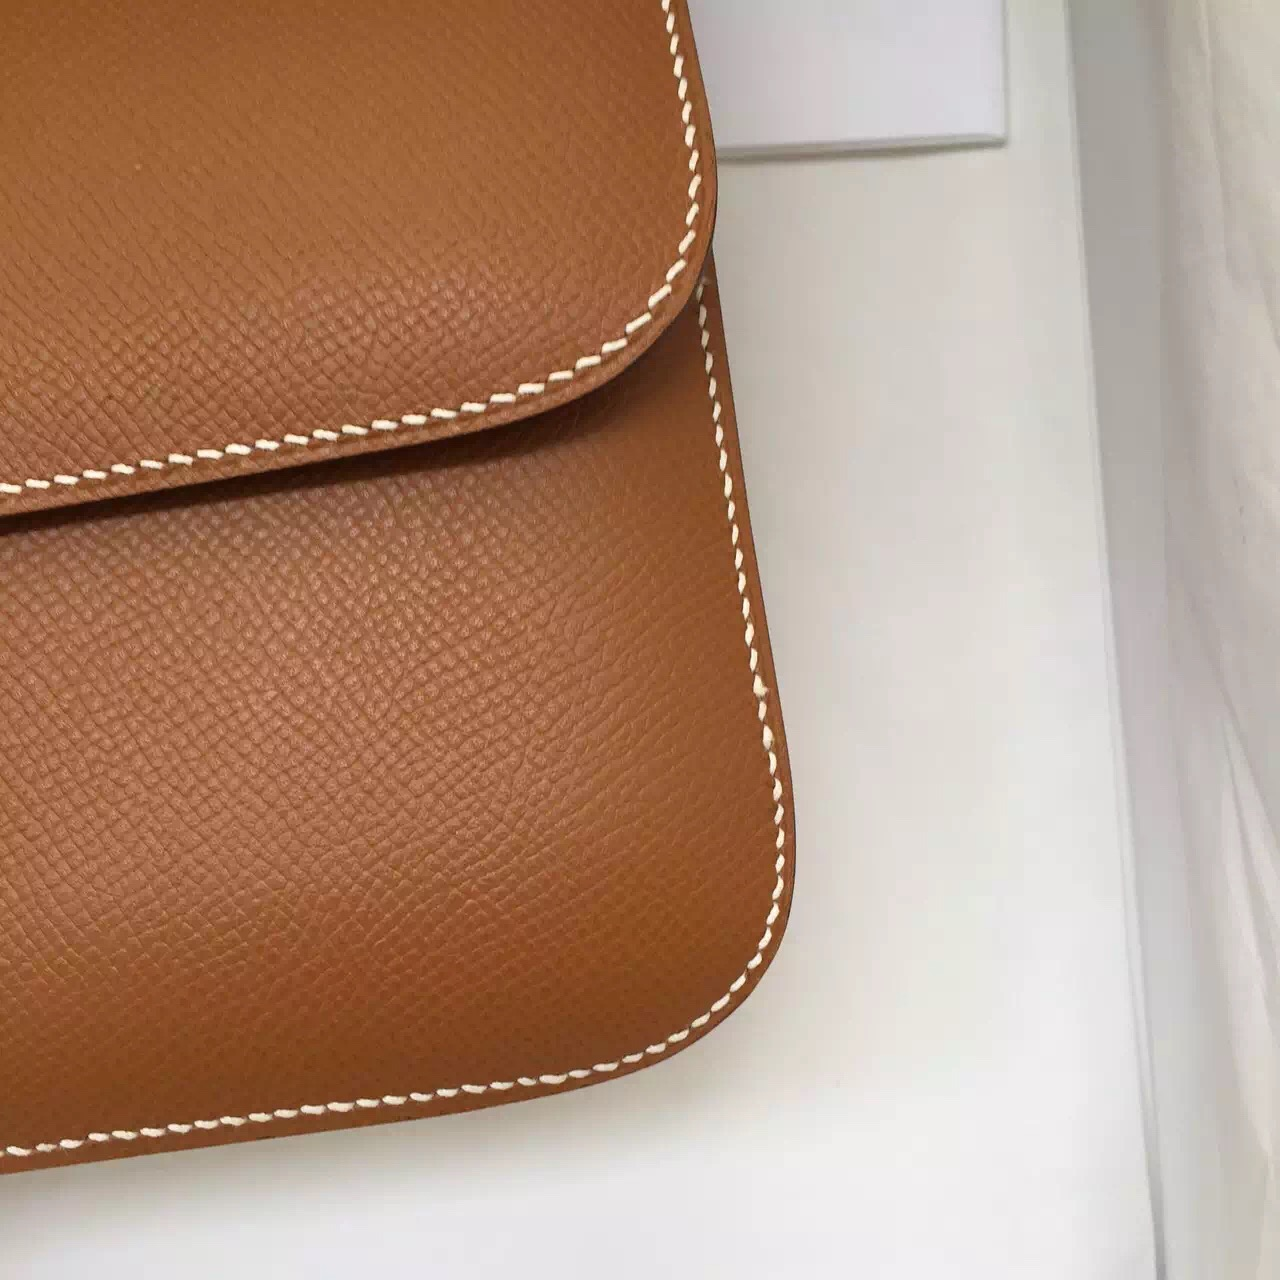 Cheap Hermes Constance Bag C37 Light Coffee Epsom Leather Ladies' Shoulder Bag